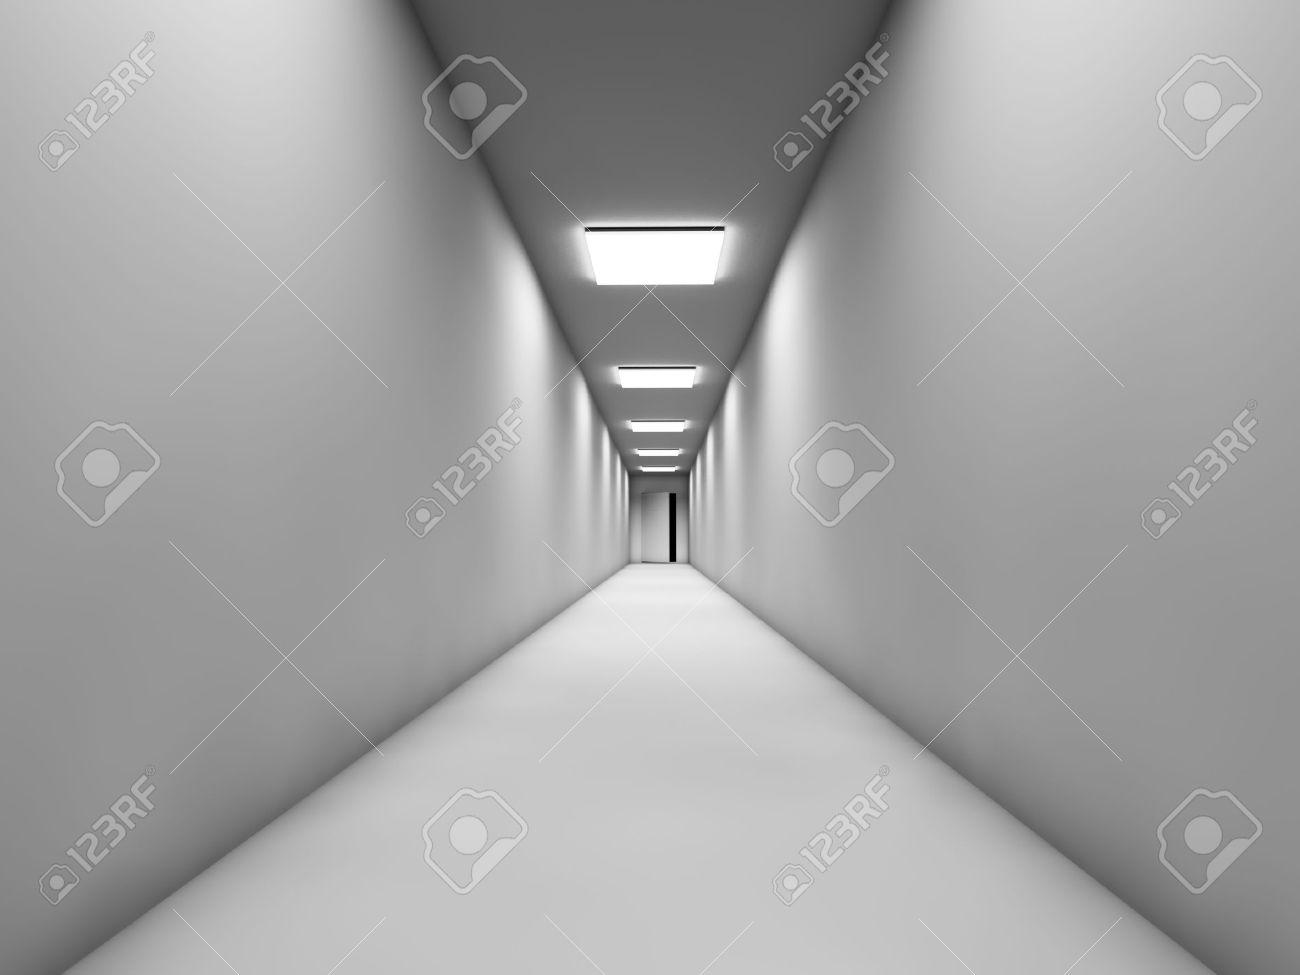 long couloir blanc avec la porte a la fin